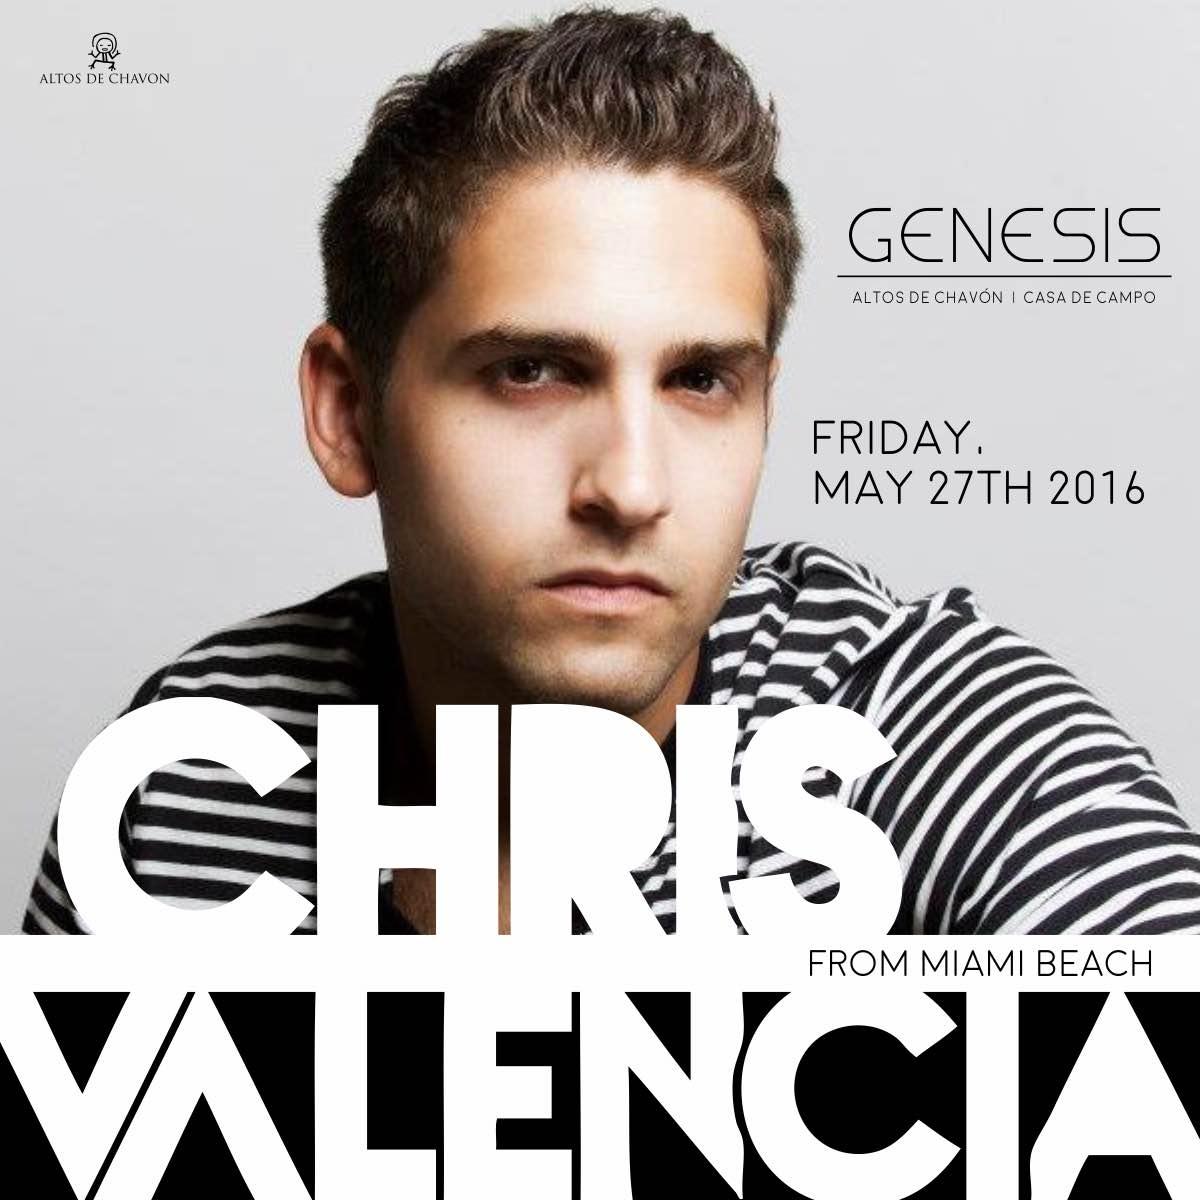 Chris Valencia Friday Flyer Genesis